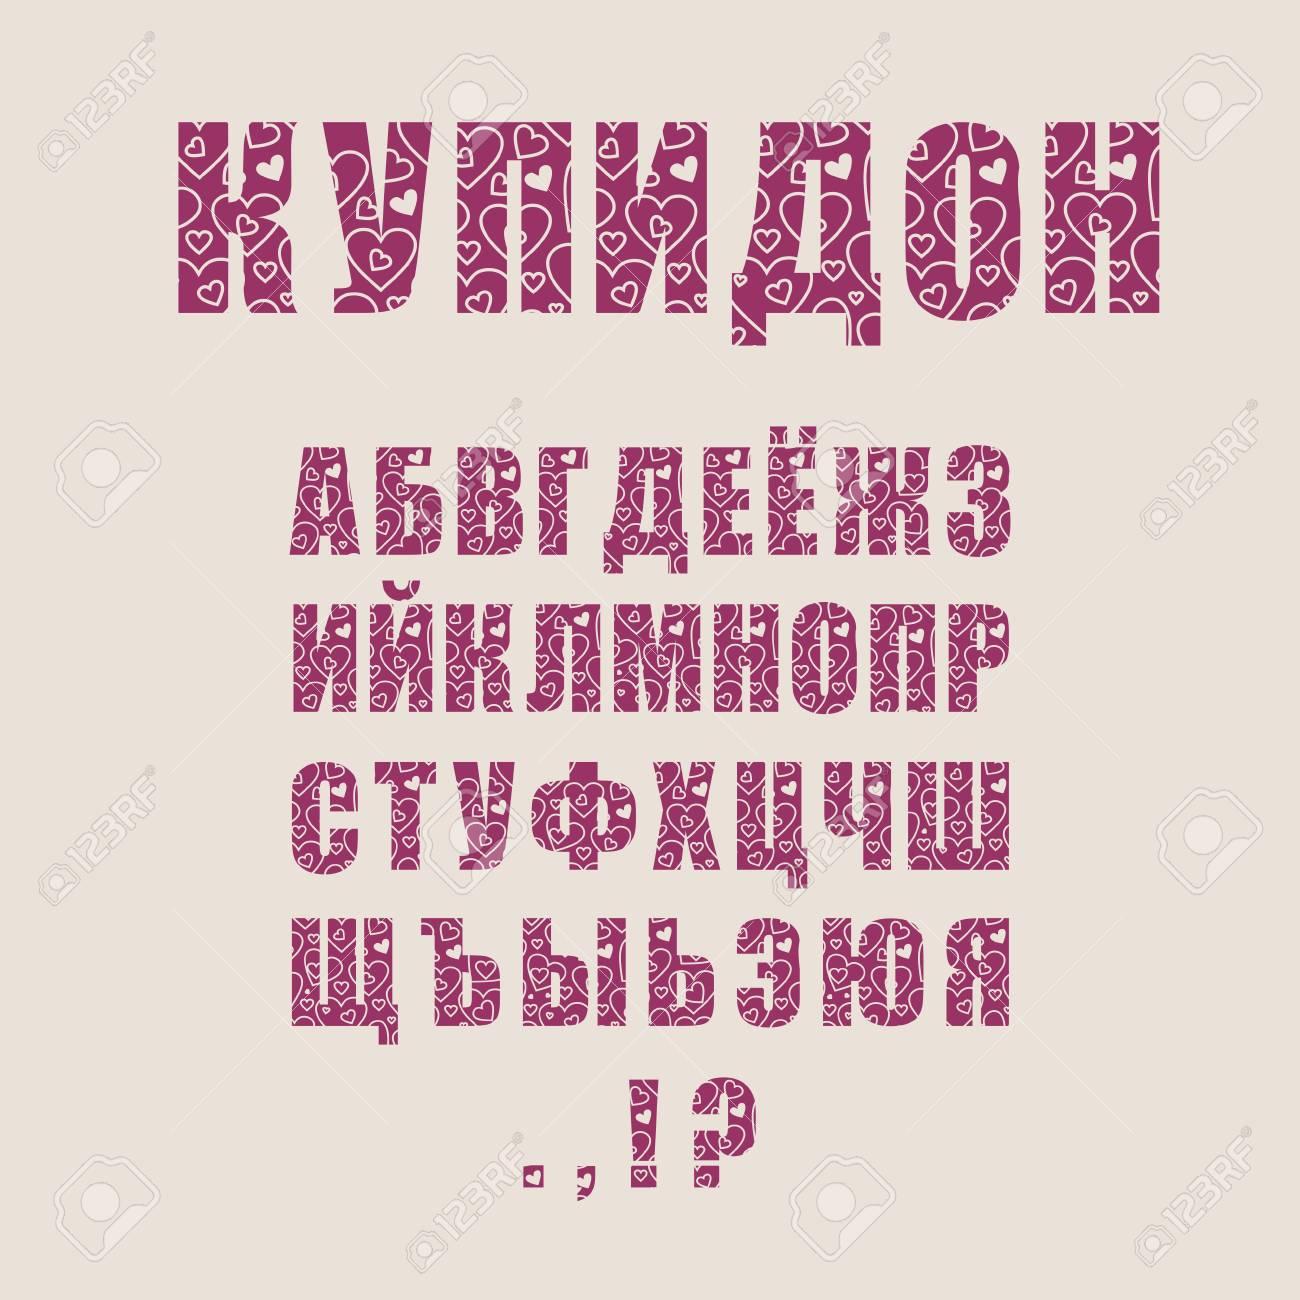 Decorative Alphabet Vector Font Letters Symbols With Outline